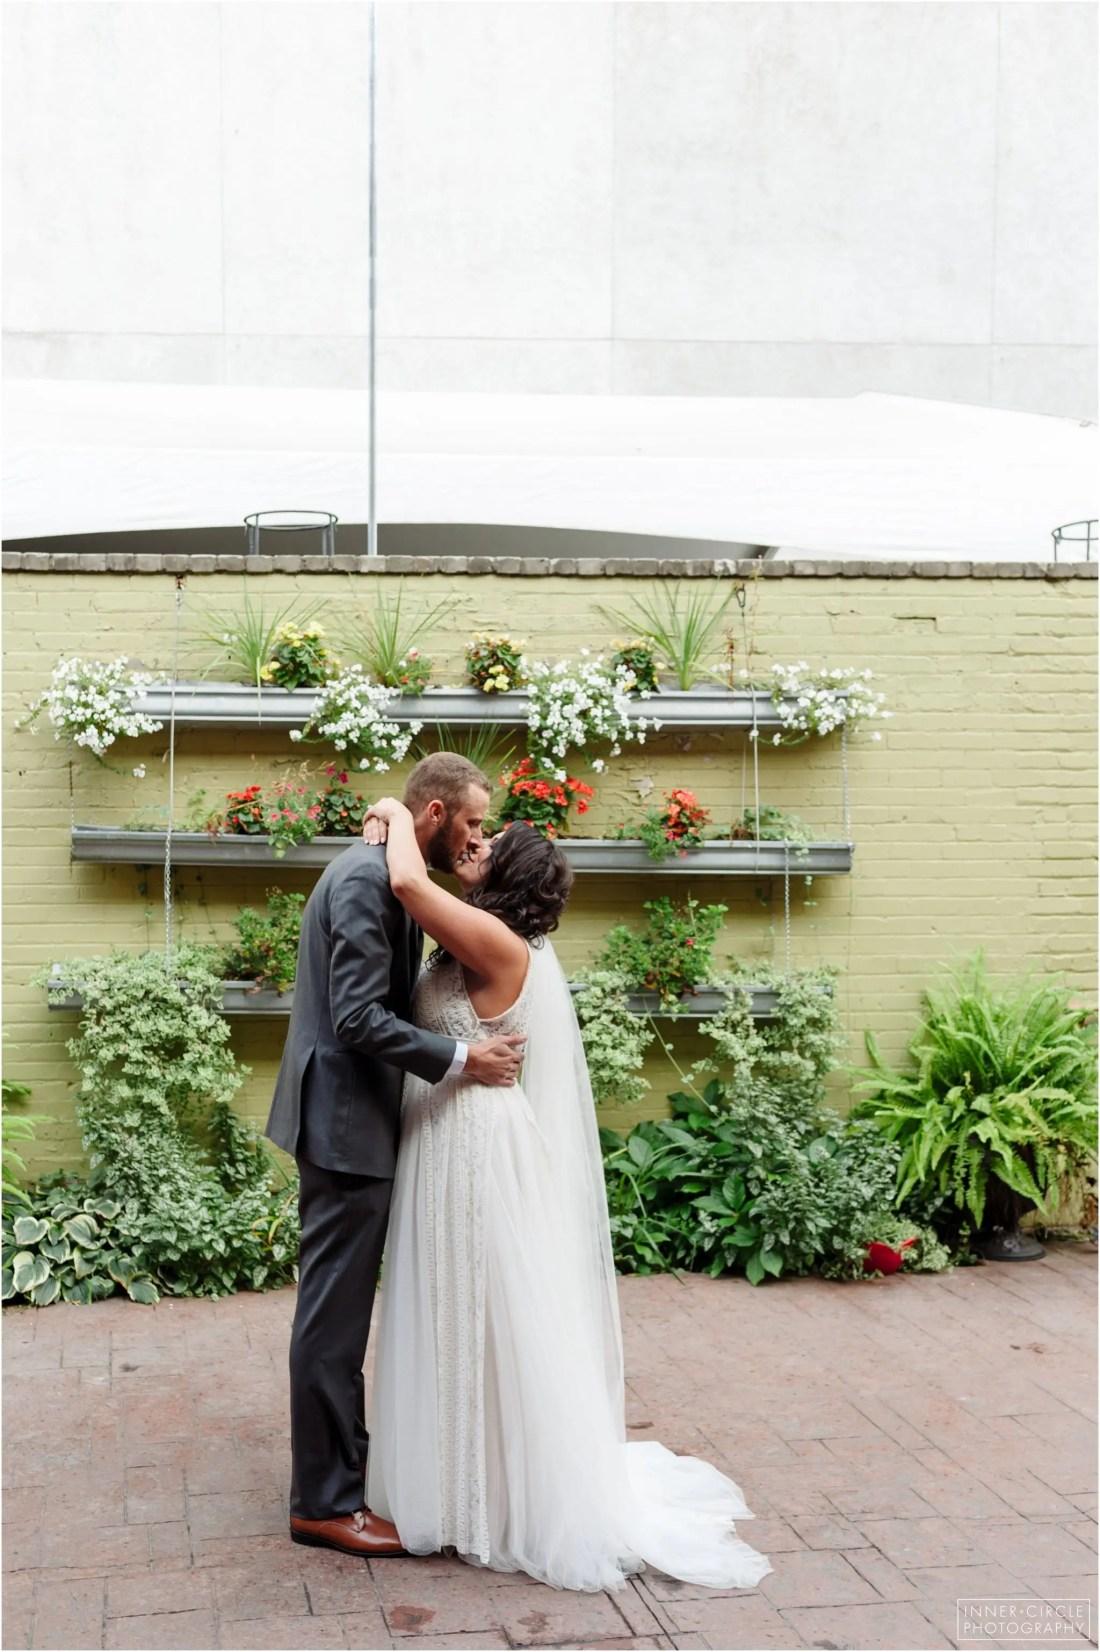 JoeMelissa_WED_InnerCirclePhoto_062 Joe + Melissa :: MARRIED!